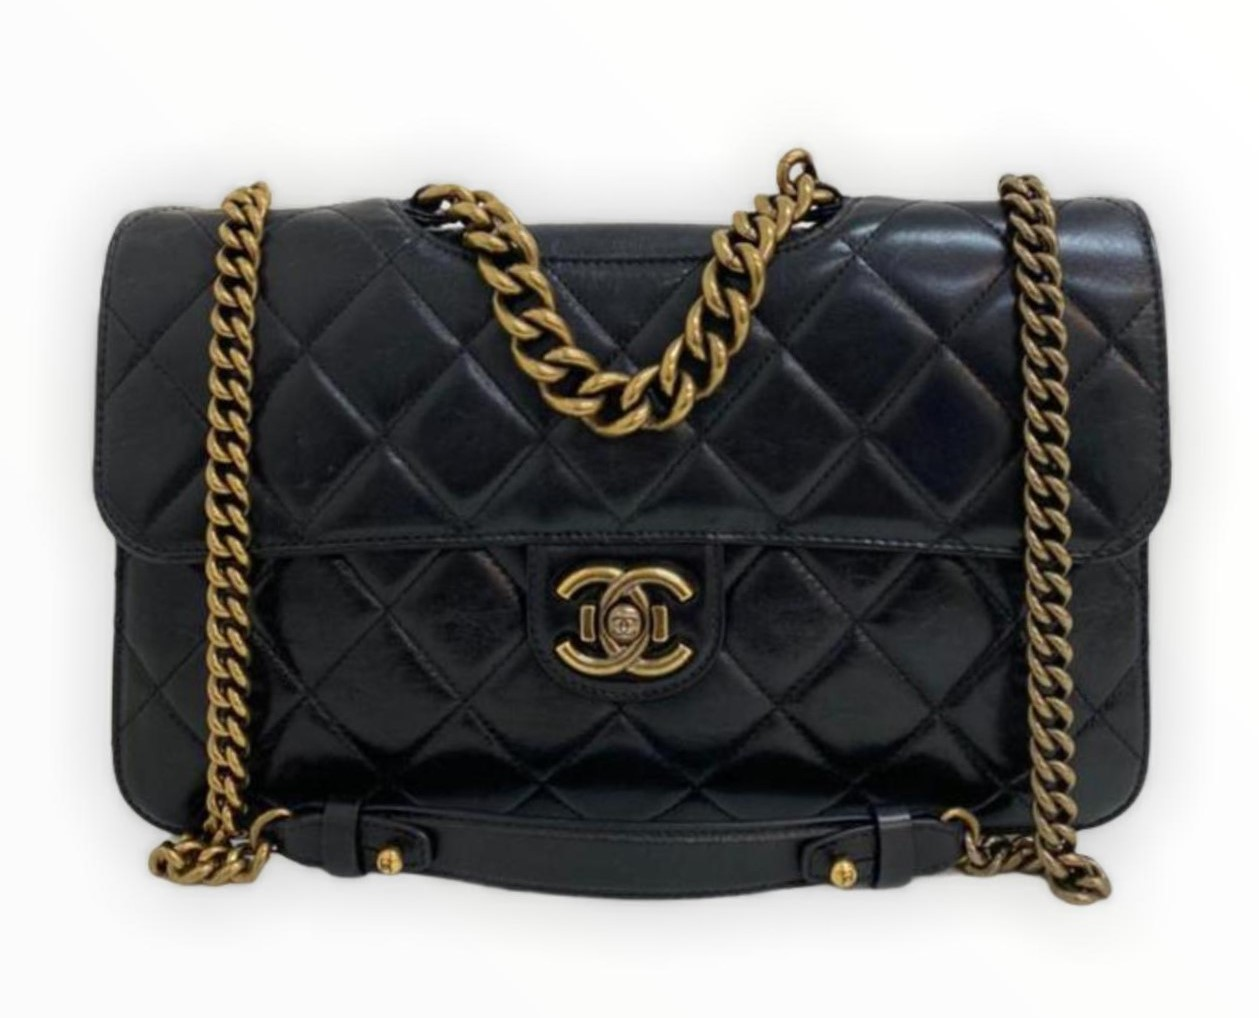 Bolsa Chanel Double Flap Preta